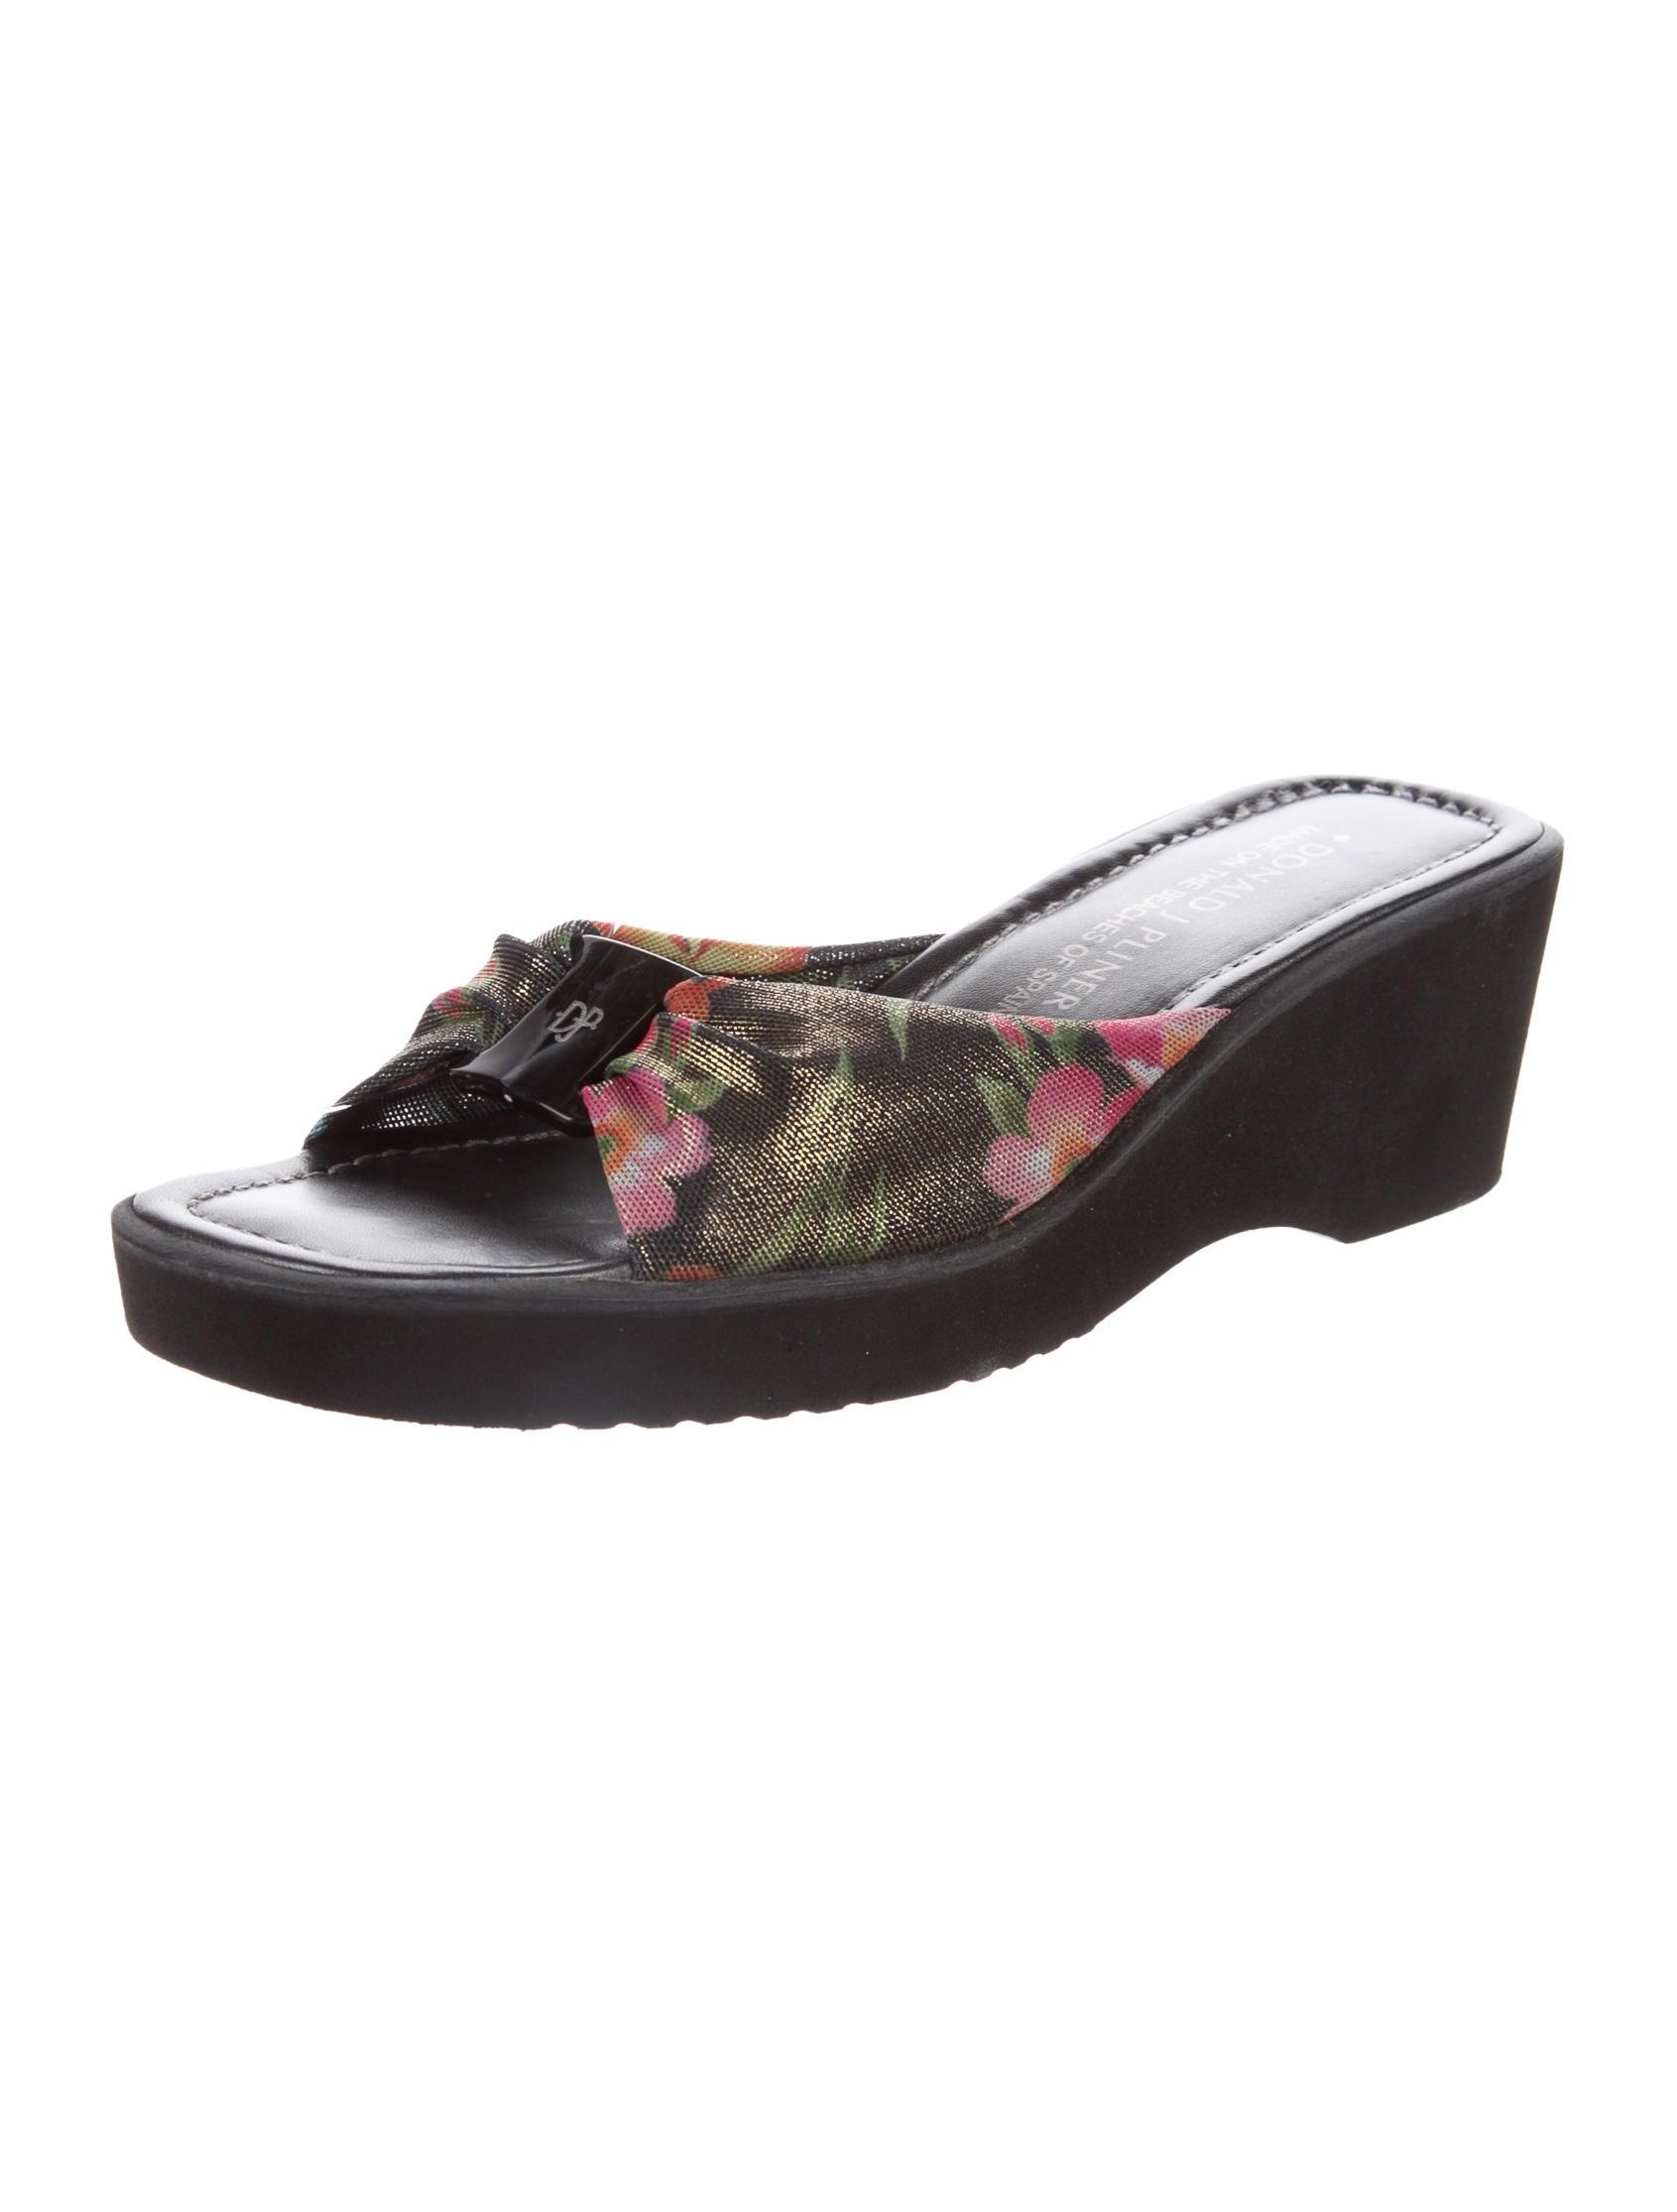 donald j pliner canvas slide sandals shoes wdj20357